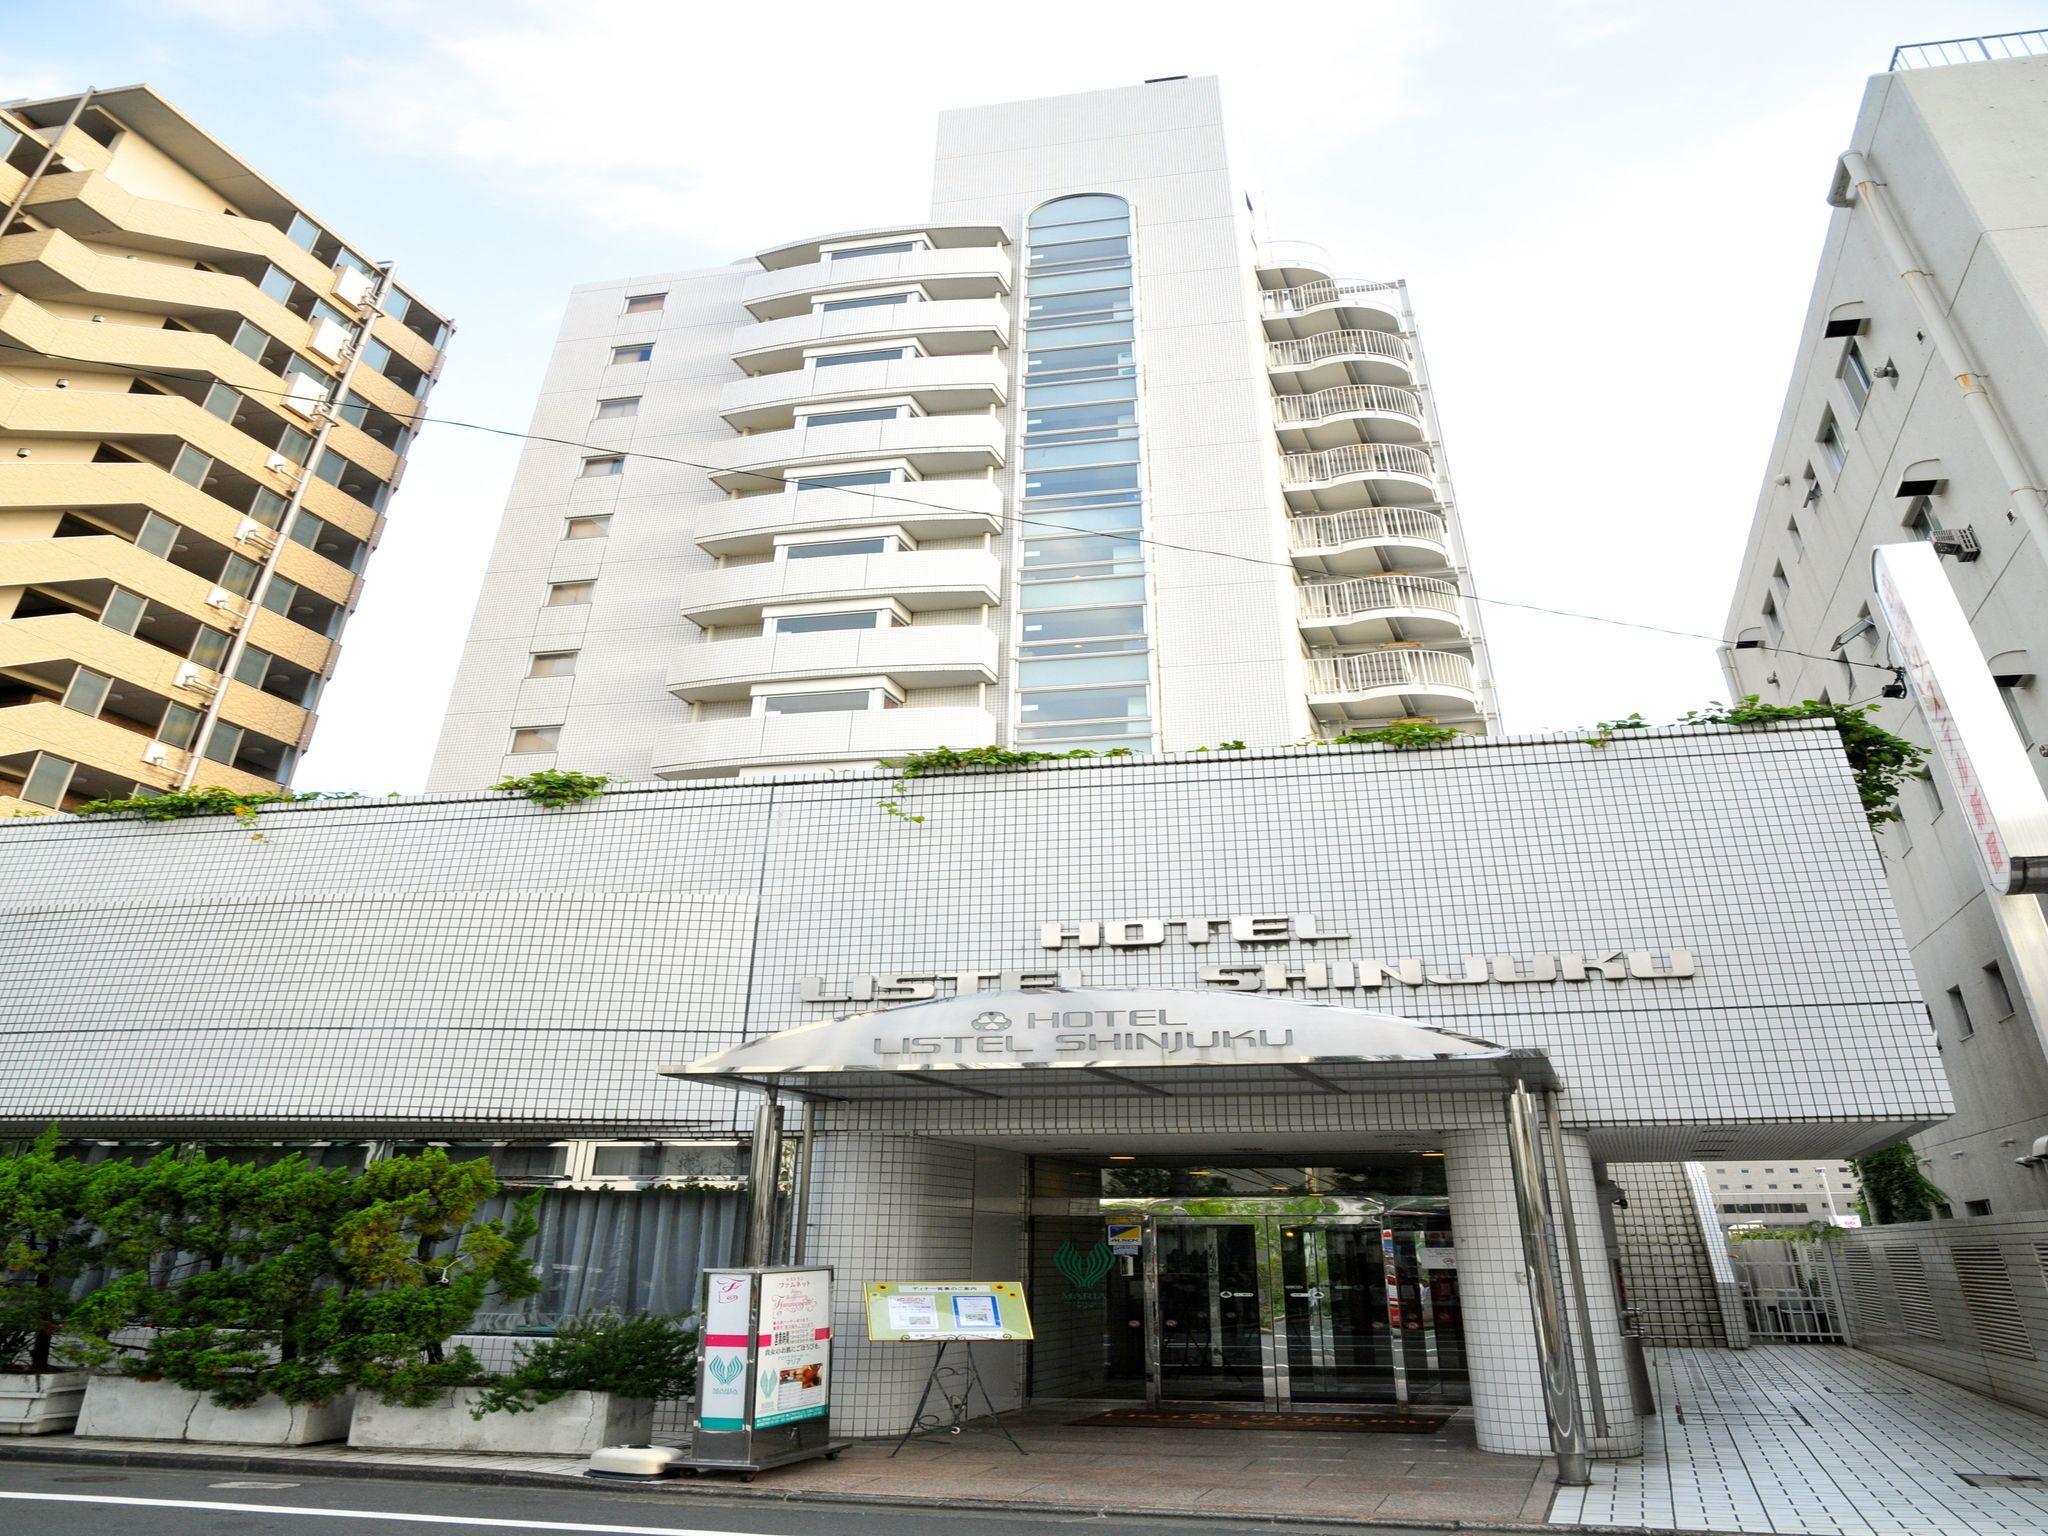 利時達新宿酒店 Hotel Listel Shinjuku